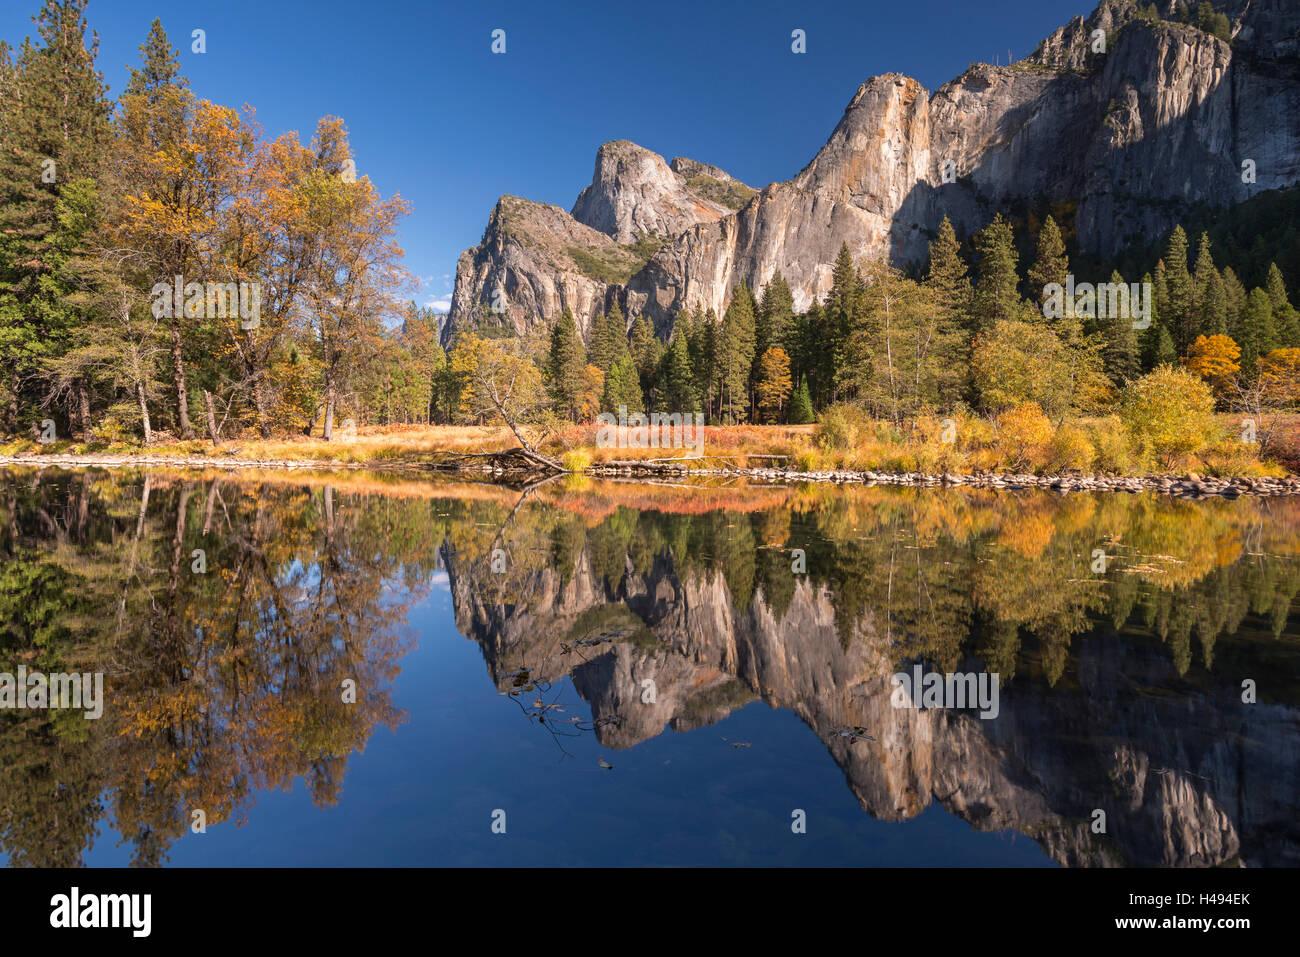 La Vallée Yosemite reflète dans la Merced River au Valley View, Yosemite National Park, California, USA. Photo Stock